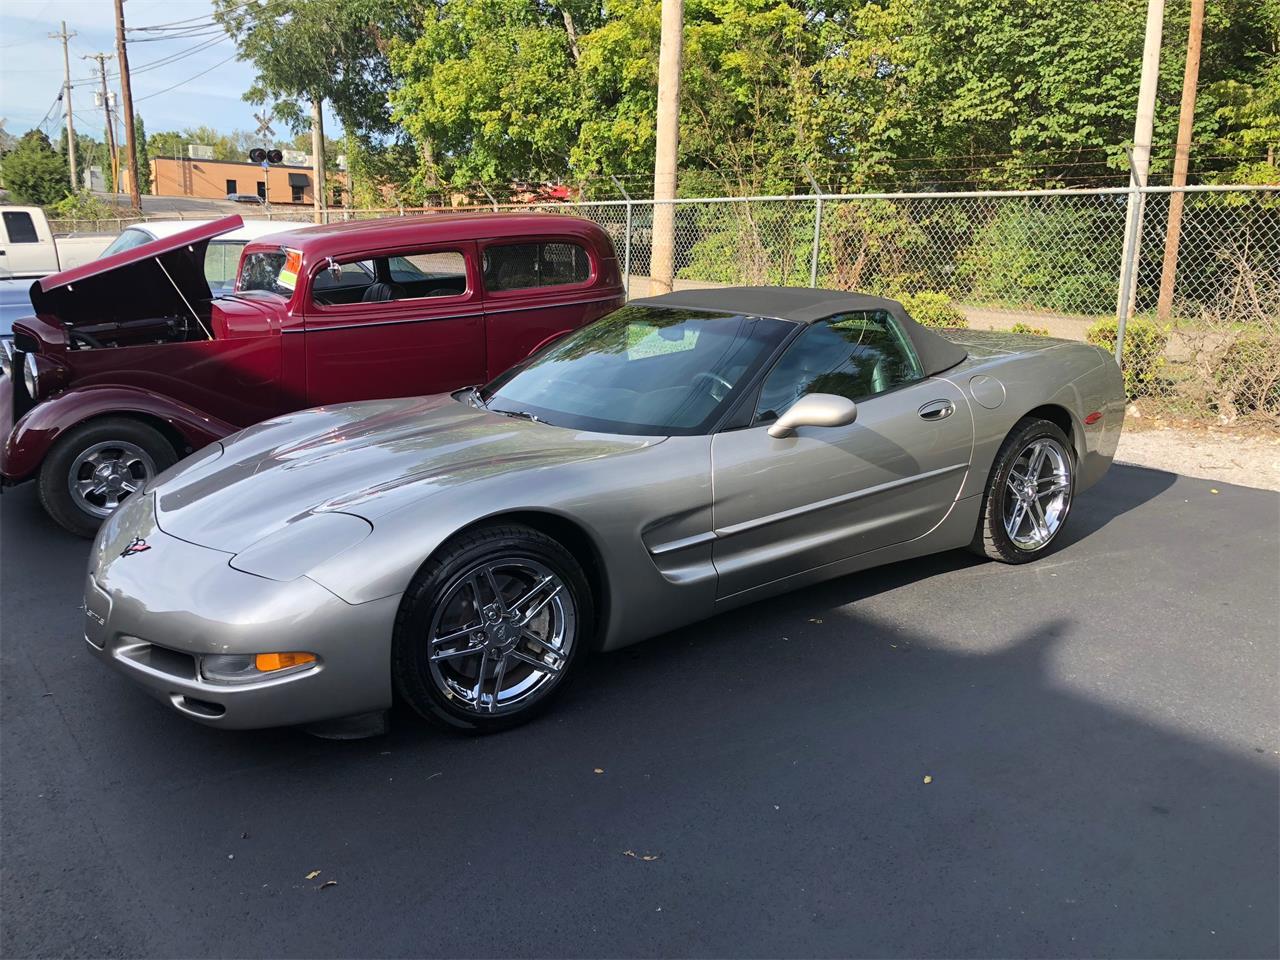 1999 Corvette For Sale >> For Sale 1999 Chevrolet Corvette In Knoxville Tennessee